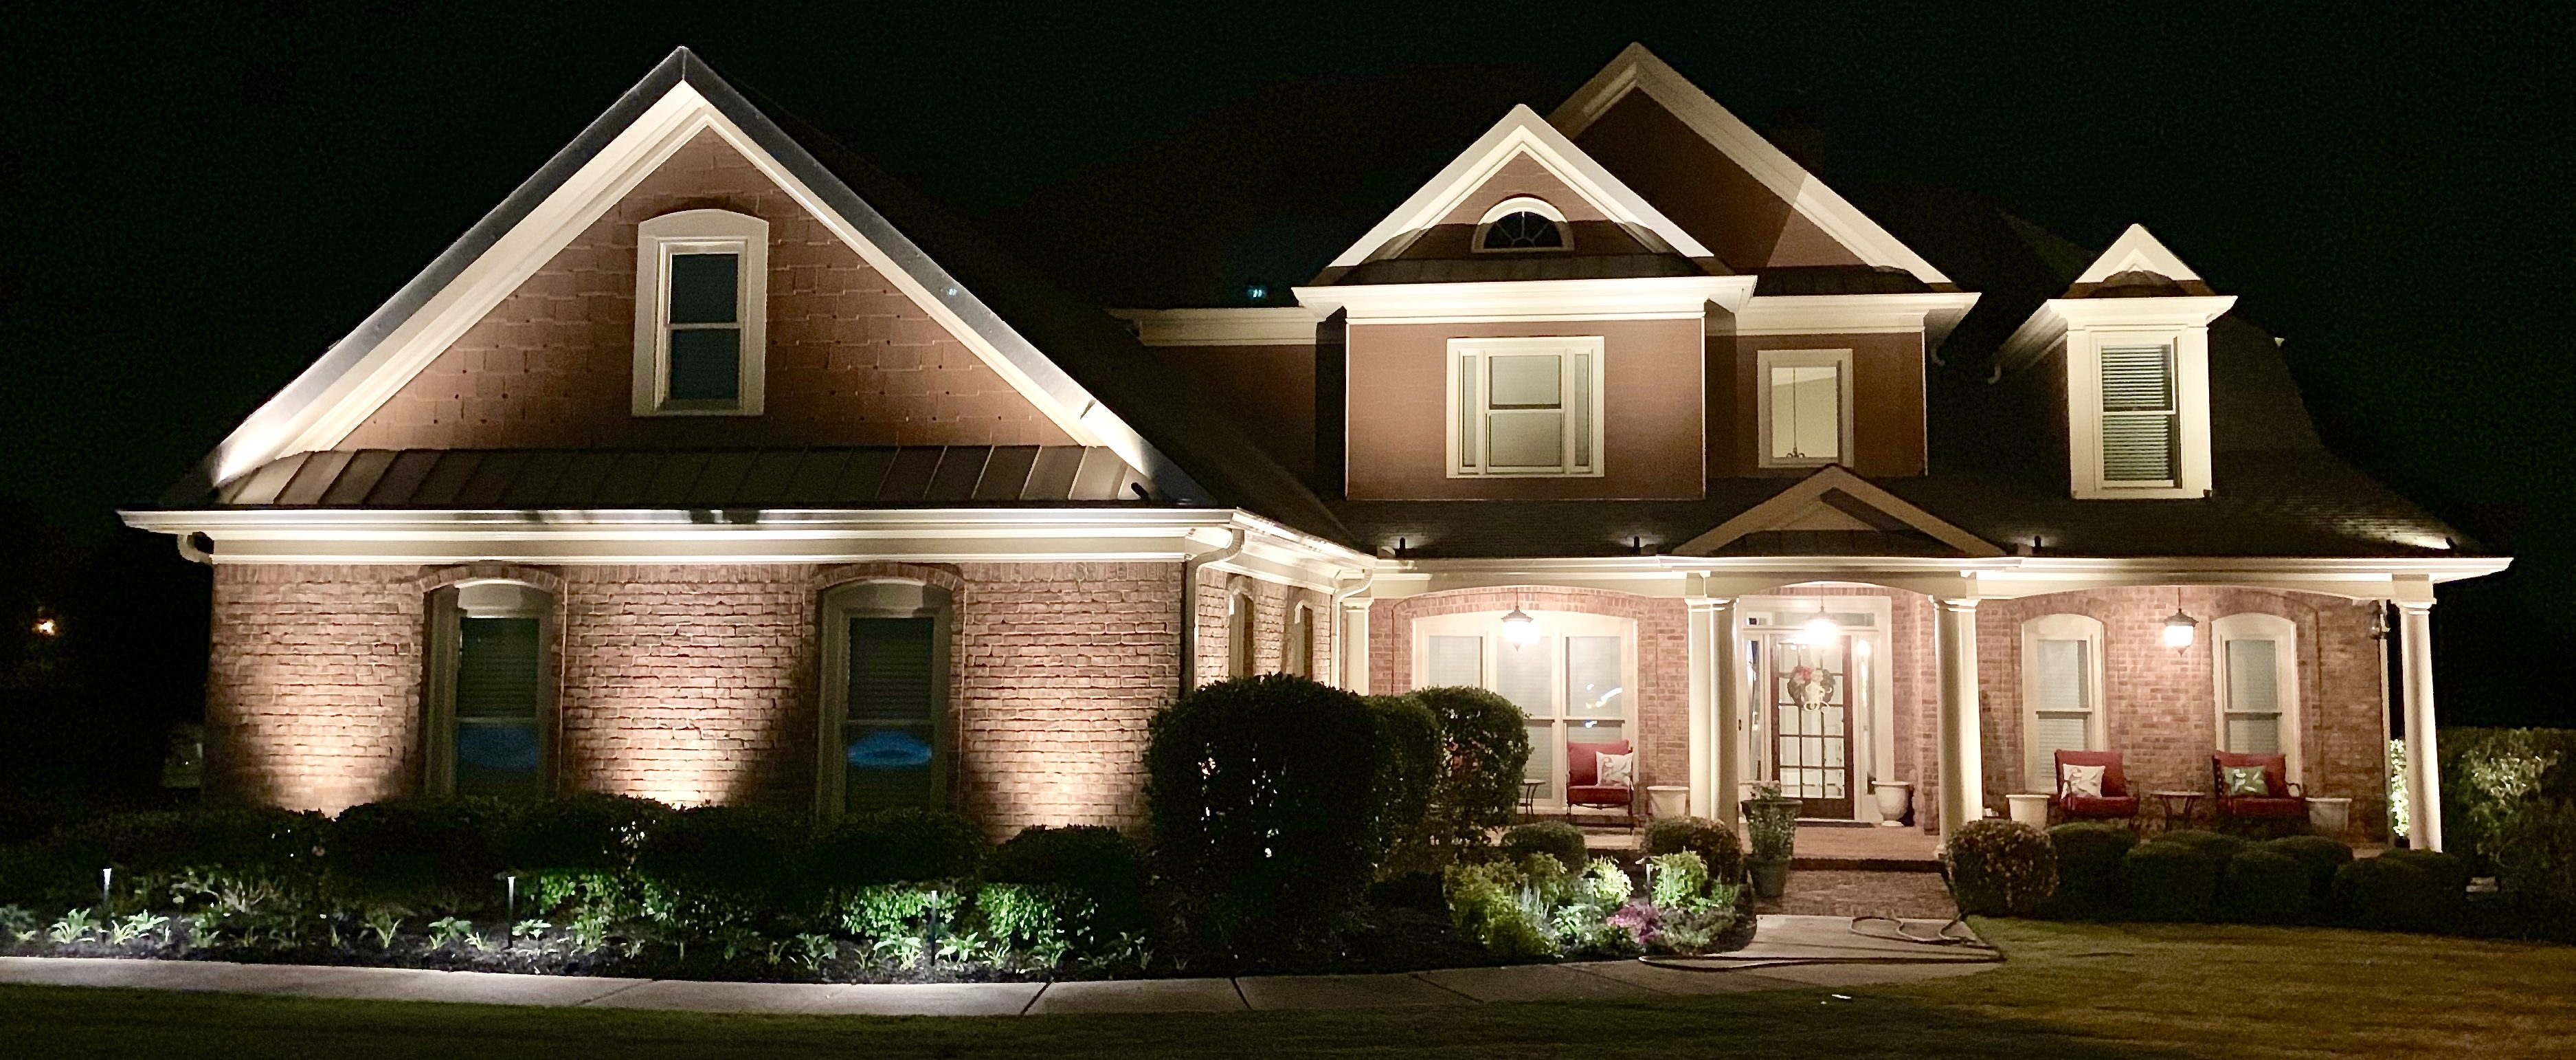 Low voltage lighting Braselton, Ga